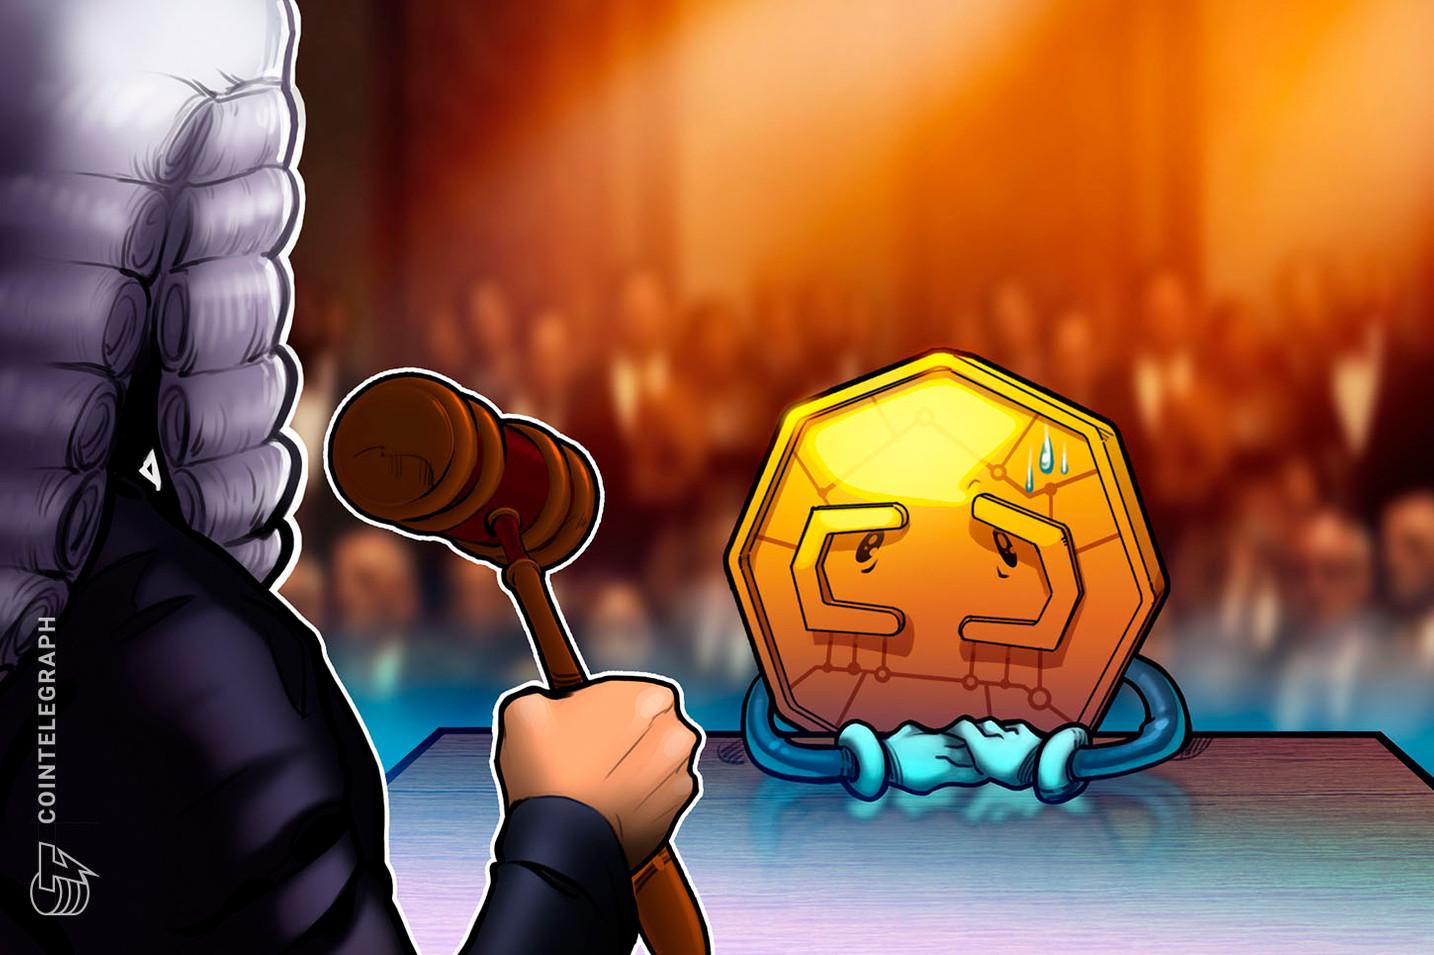 Juiz repreende defesa da BitMEX por oferecerem a ele aulas de 'princípios básicos sobre criptomoedas'